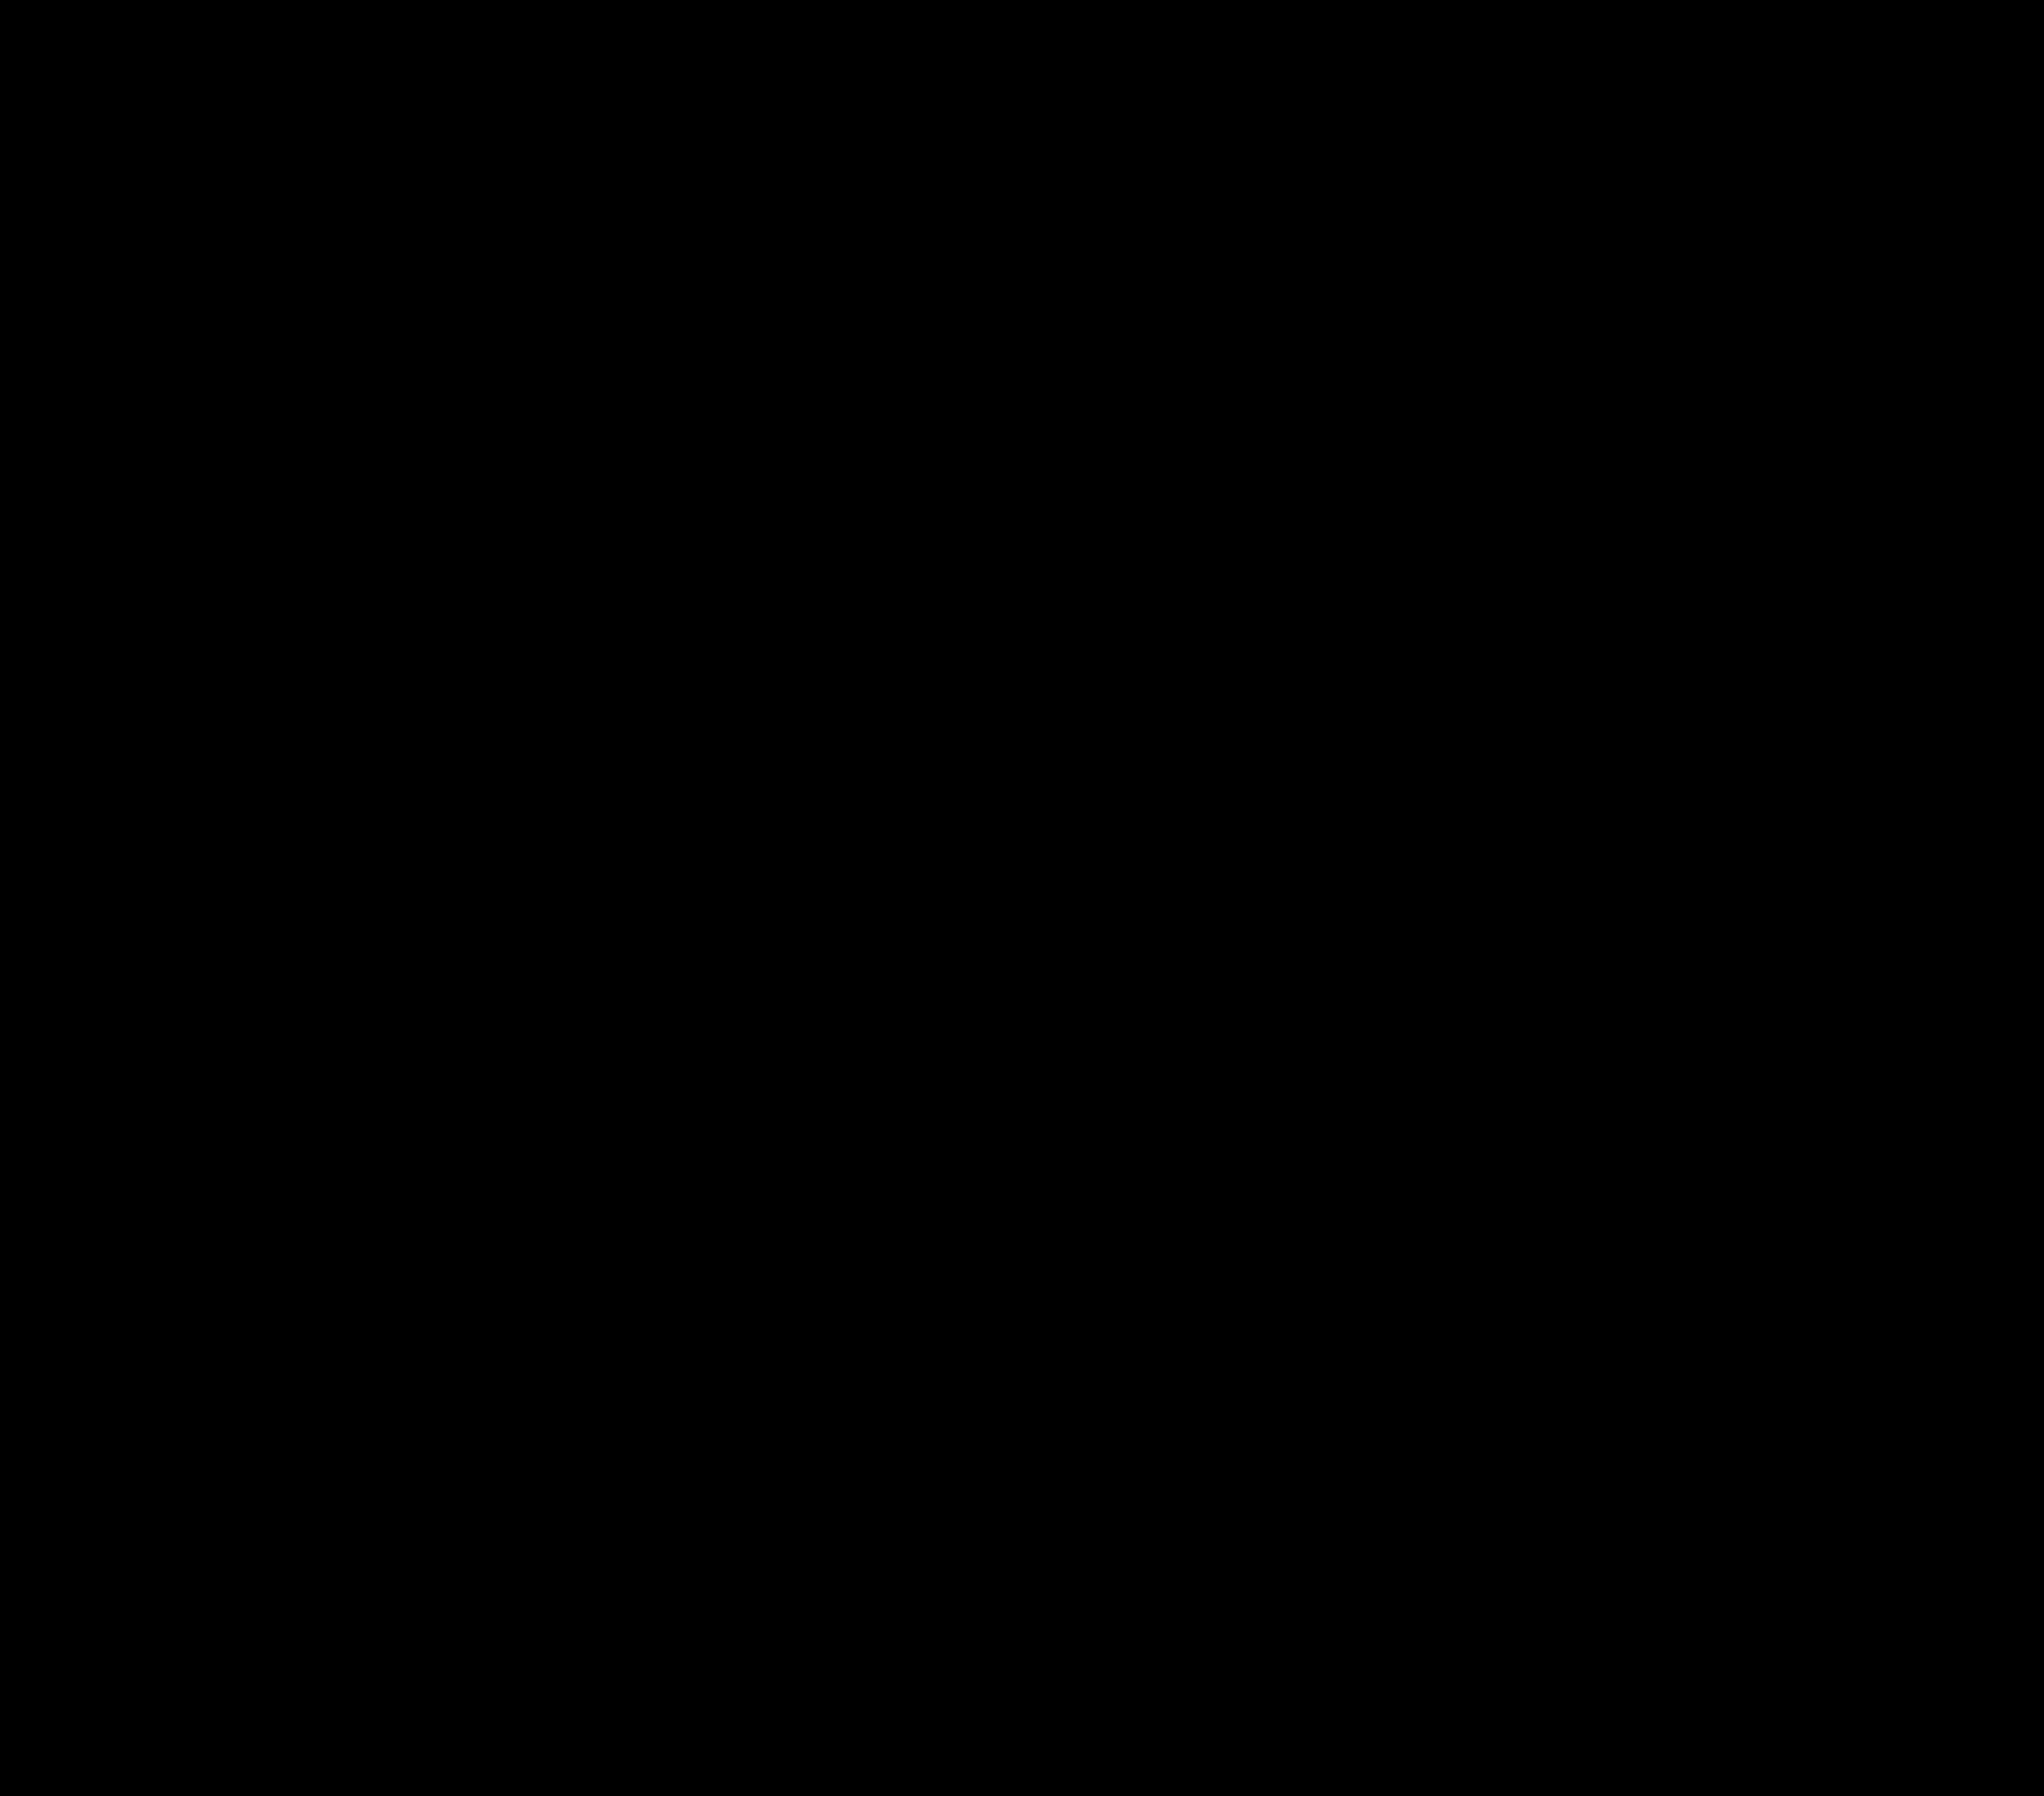 2187x1922 Clipart